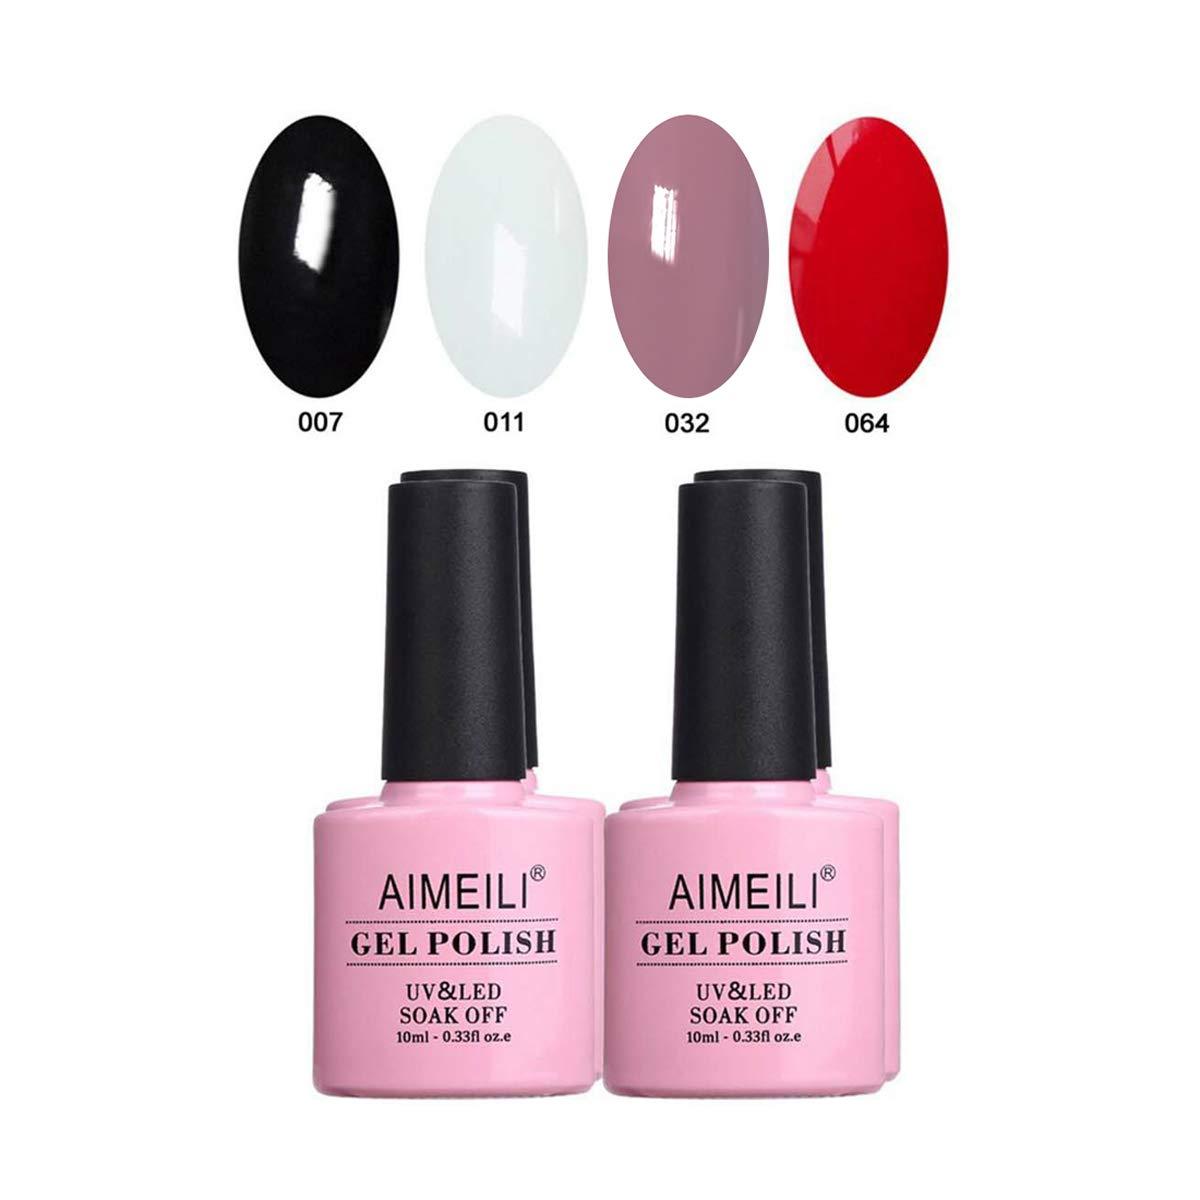 AIMEILI Kit de Esmalte Semipermanente Para Uñas Esmaltes de Uñas Esmaltes en Gel Uñas UV LED